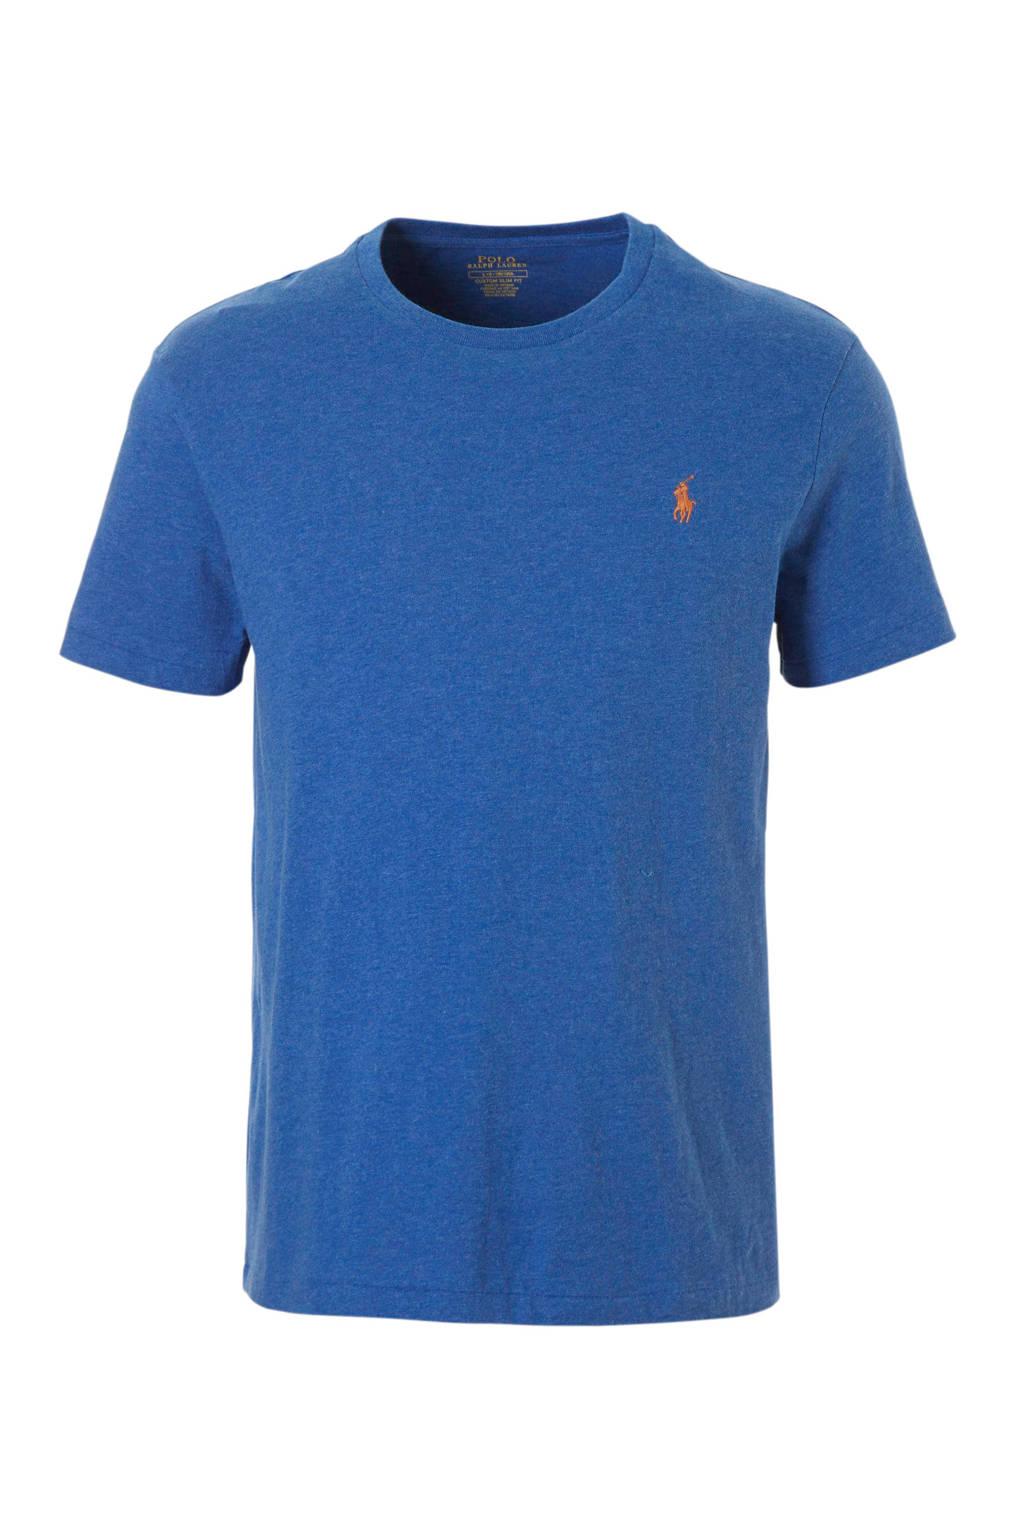 POLO Ralph Lauren slim fit T-shirt, Blauw